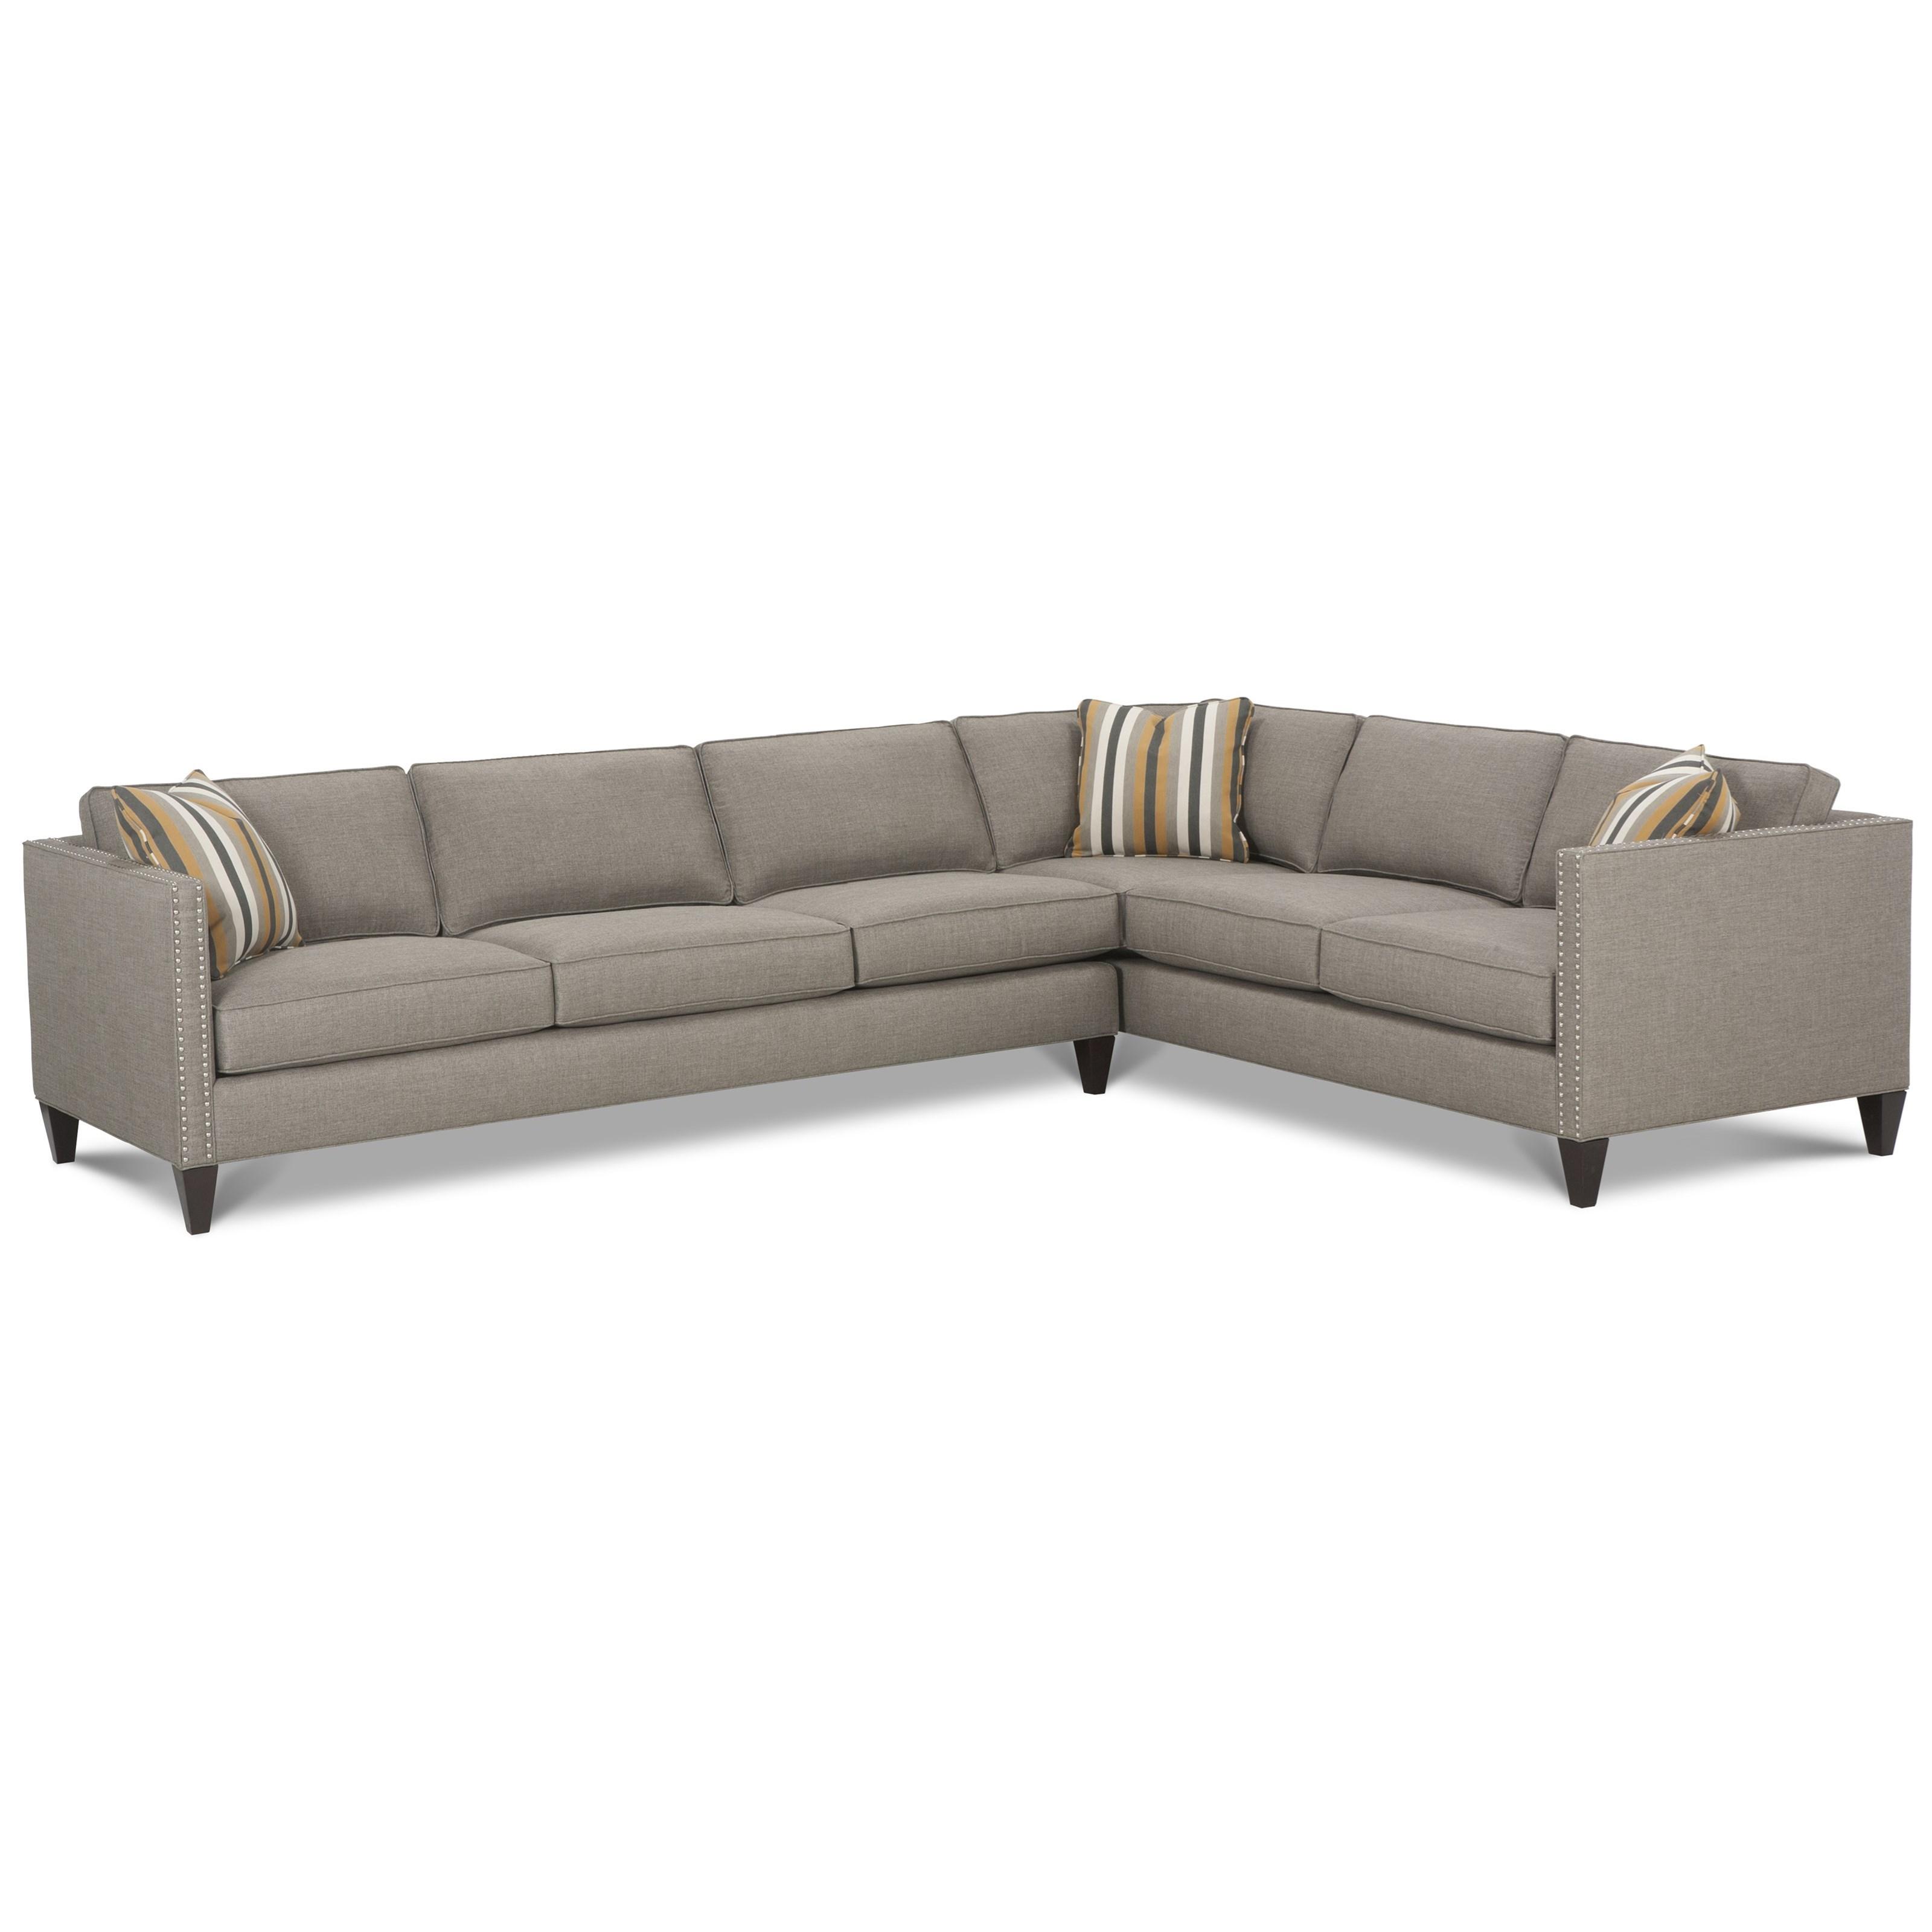 Mitchell - RXO <b>Custom</b> Sectional Sofa by Rowe at Baer's Furniture